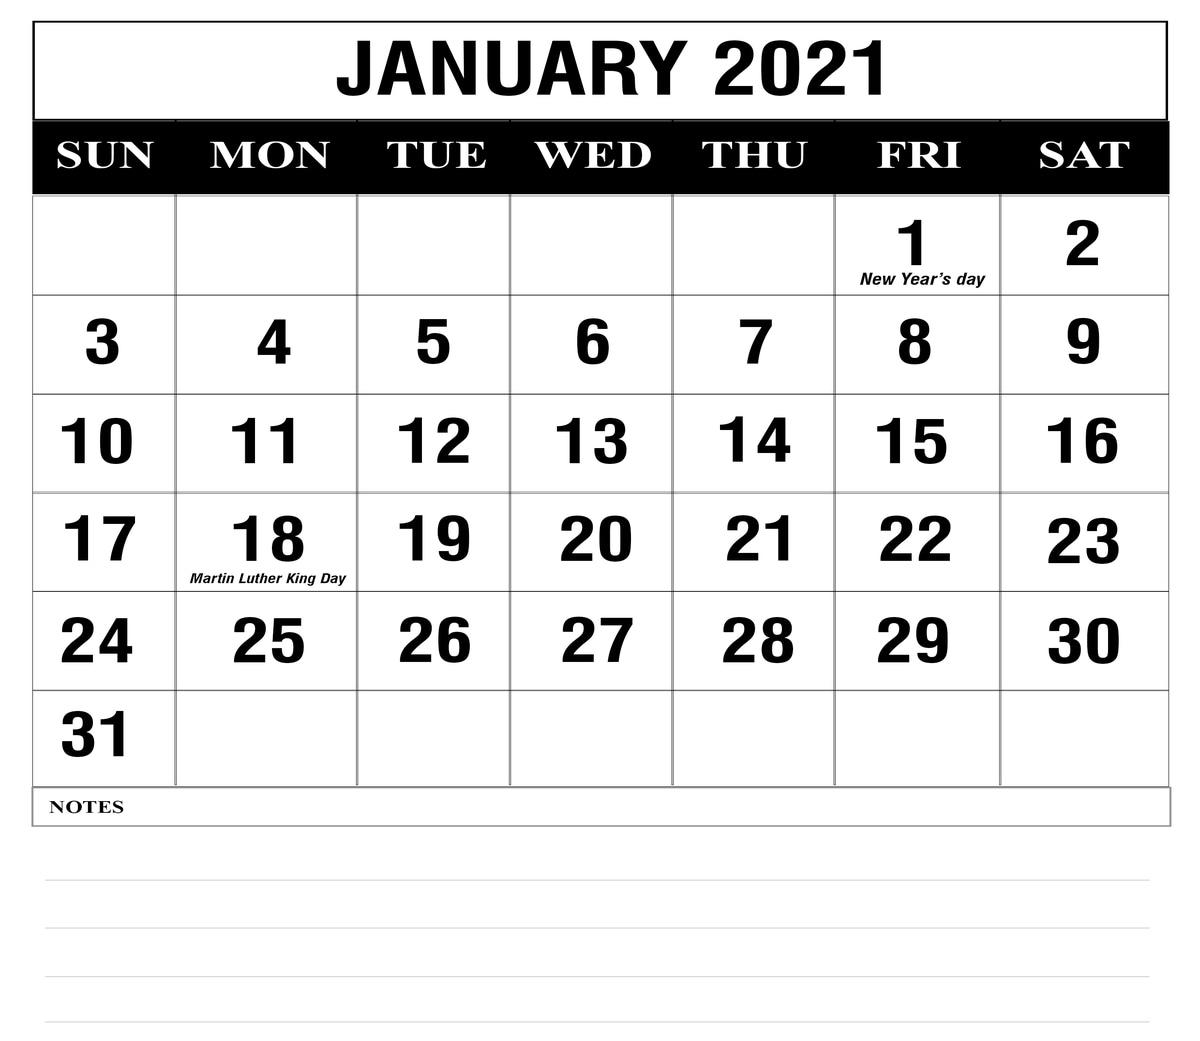 Free January 2021 Printable Calendar Template In Pdf, Excel With Julian Vs Gregorian Calendar 2021